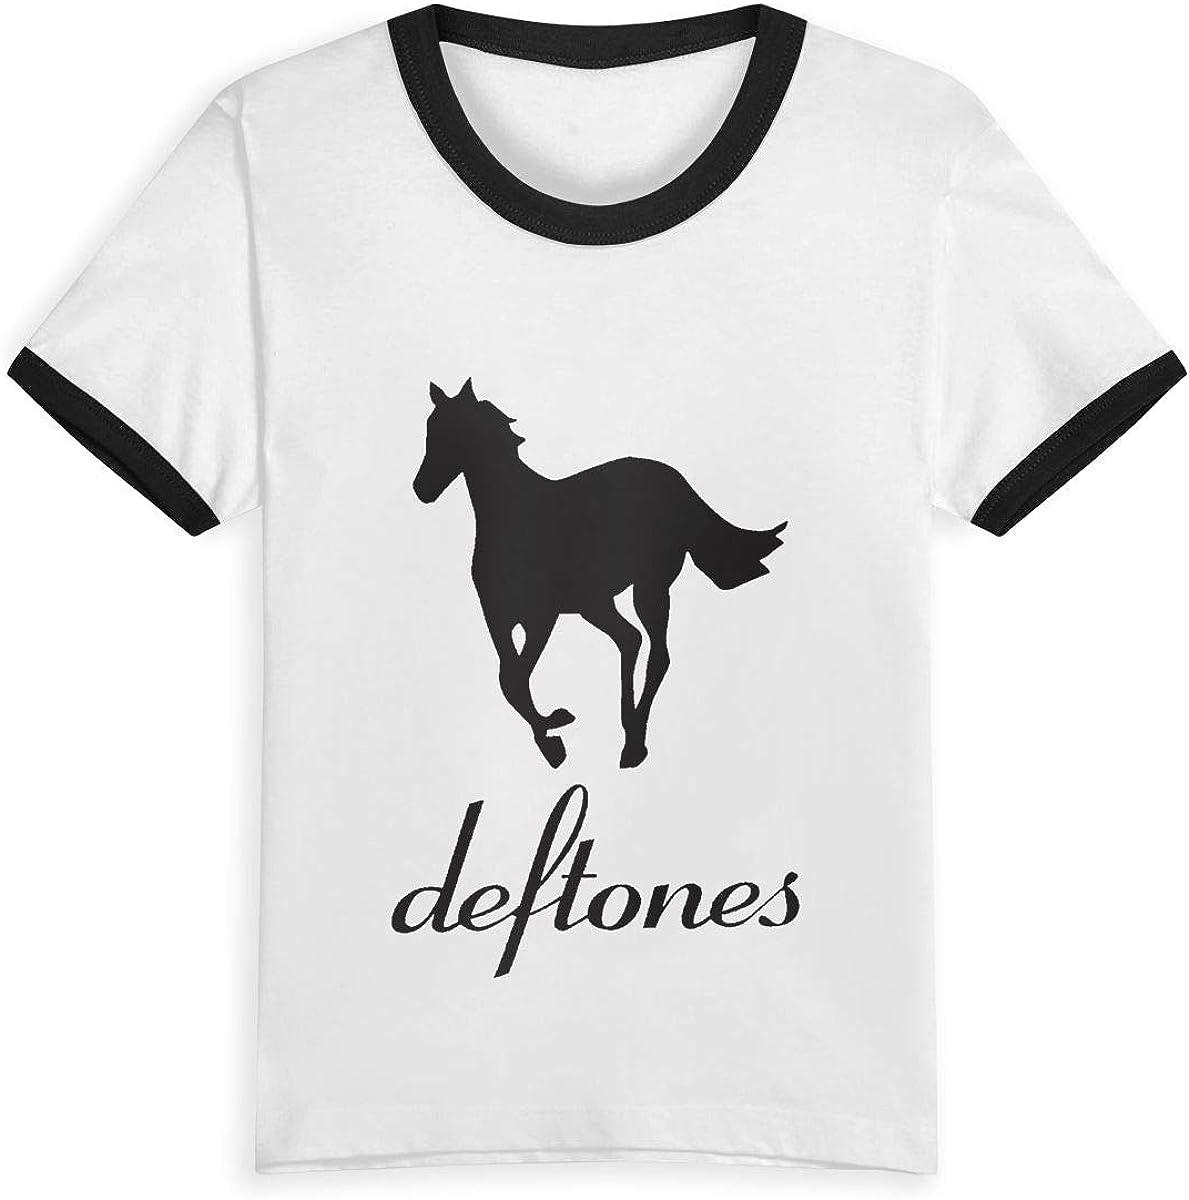 Custom Deftones Unisex Youths Short Sleeve T-Shirt Kids T-Shirt Tops Black